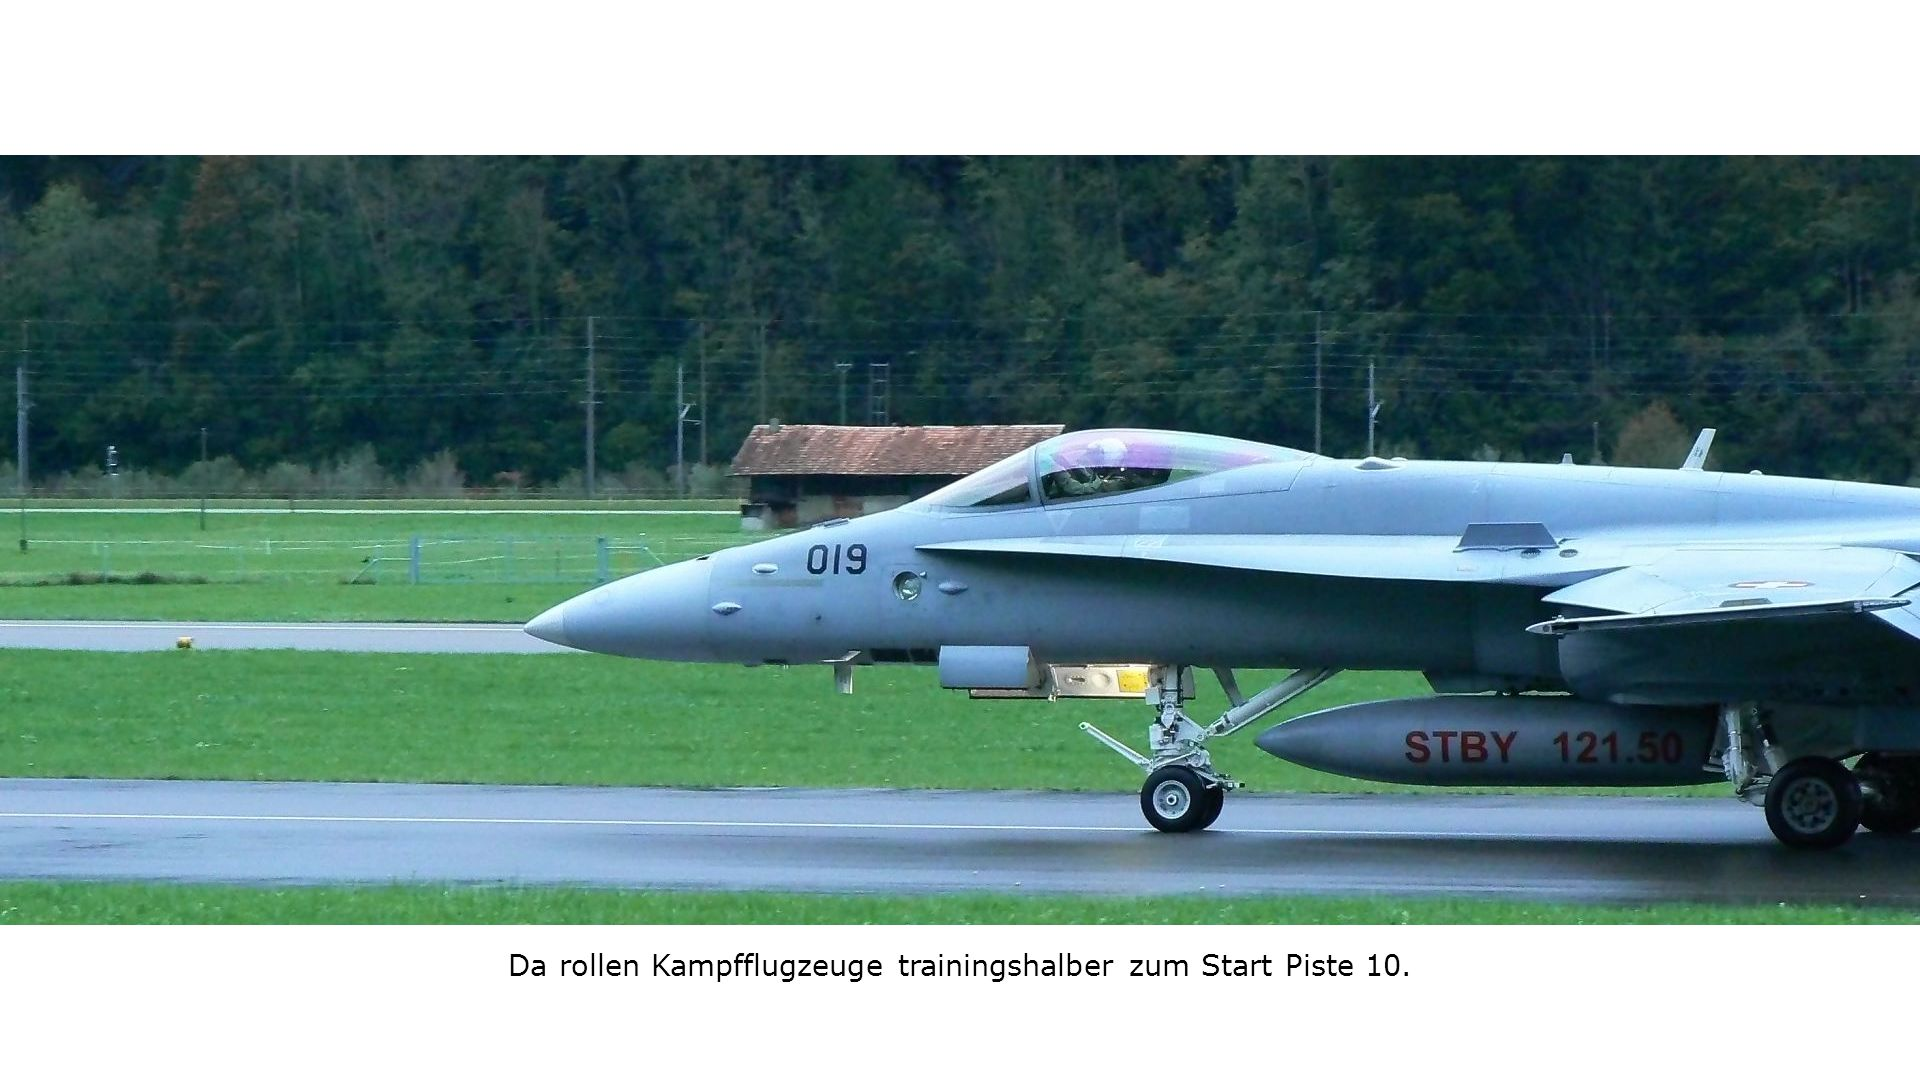 Da rollen Kampfflugzeuge trainingshalber zum Start Piste 10.